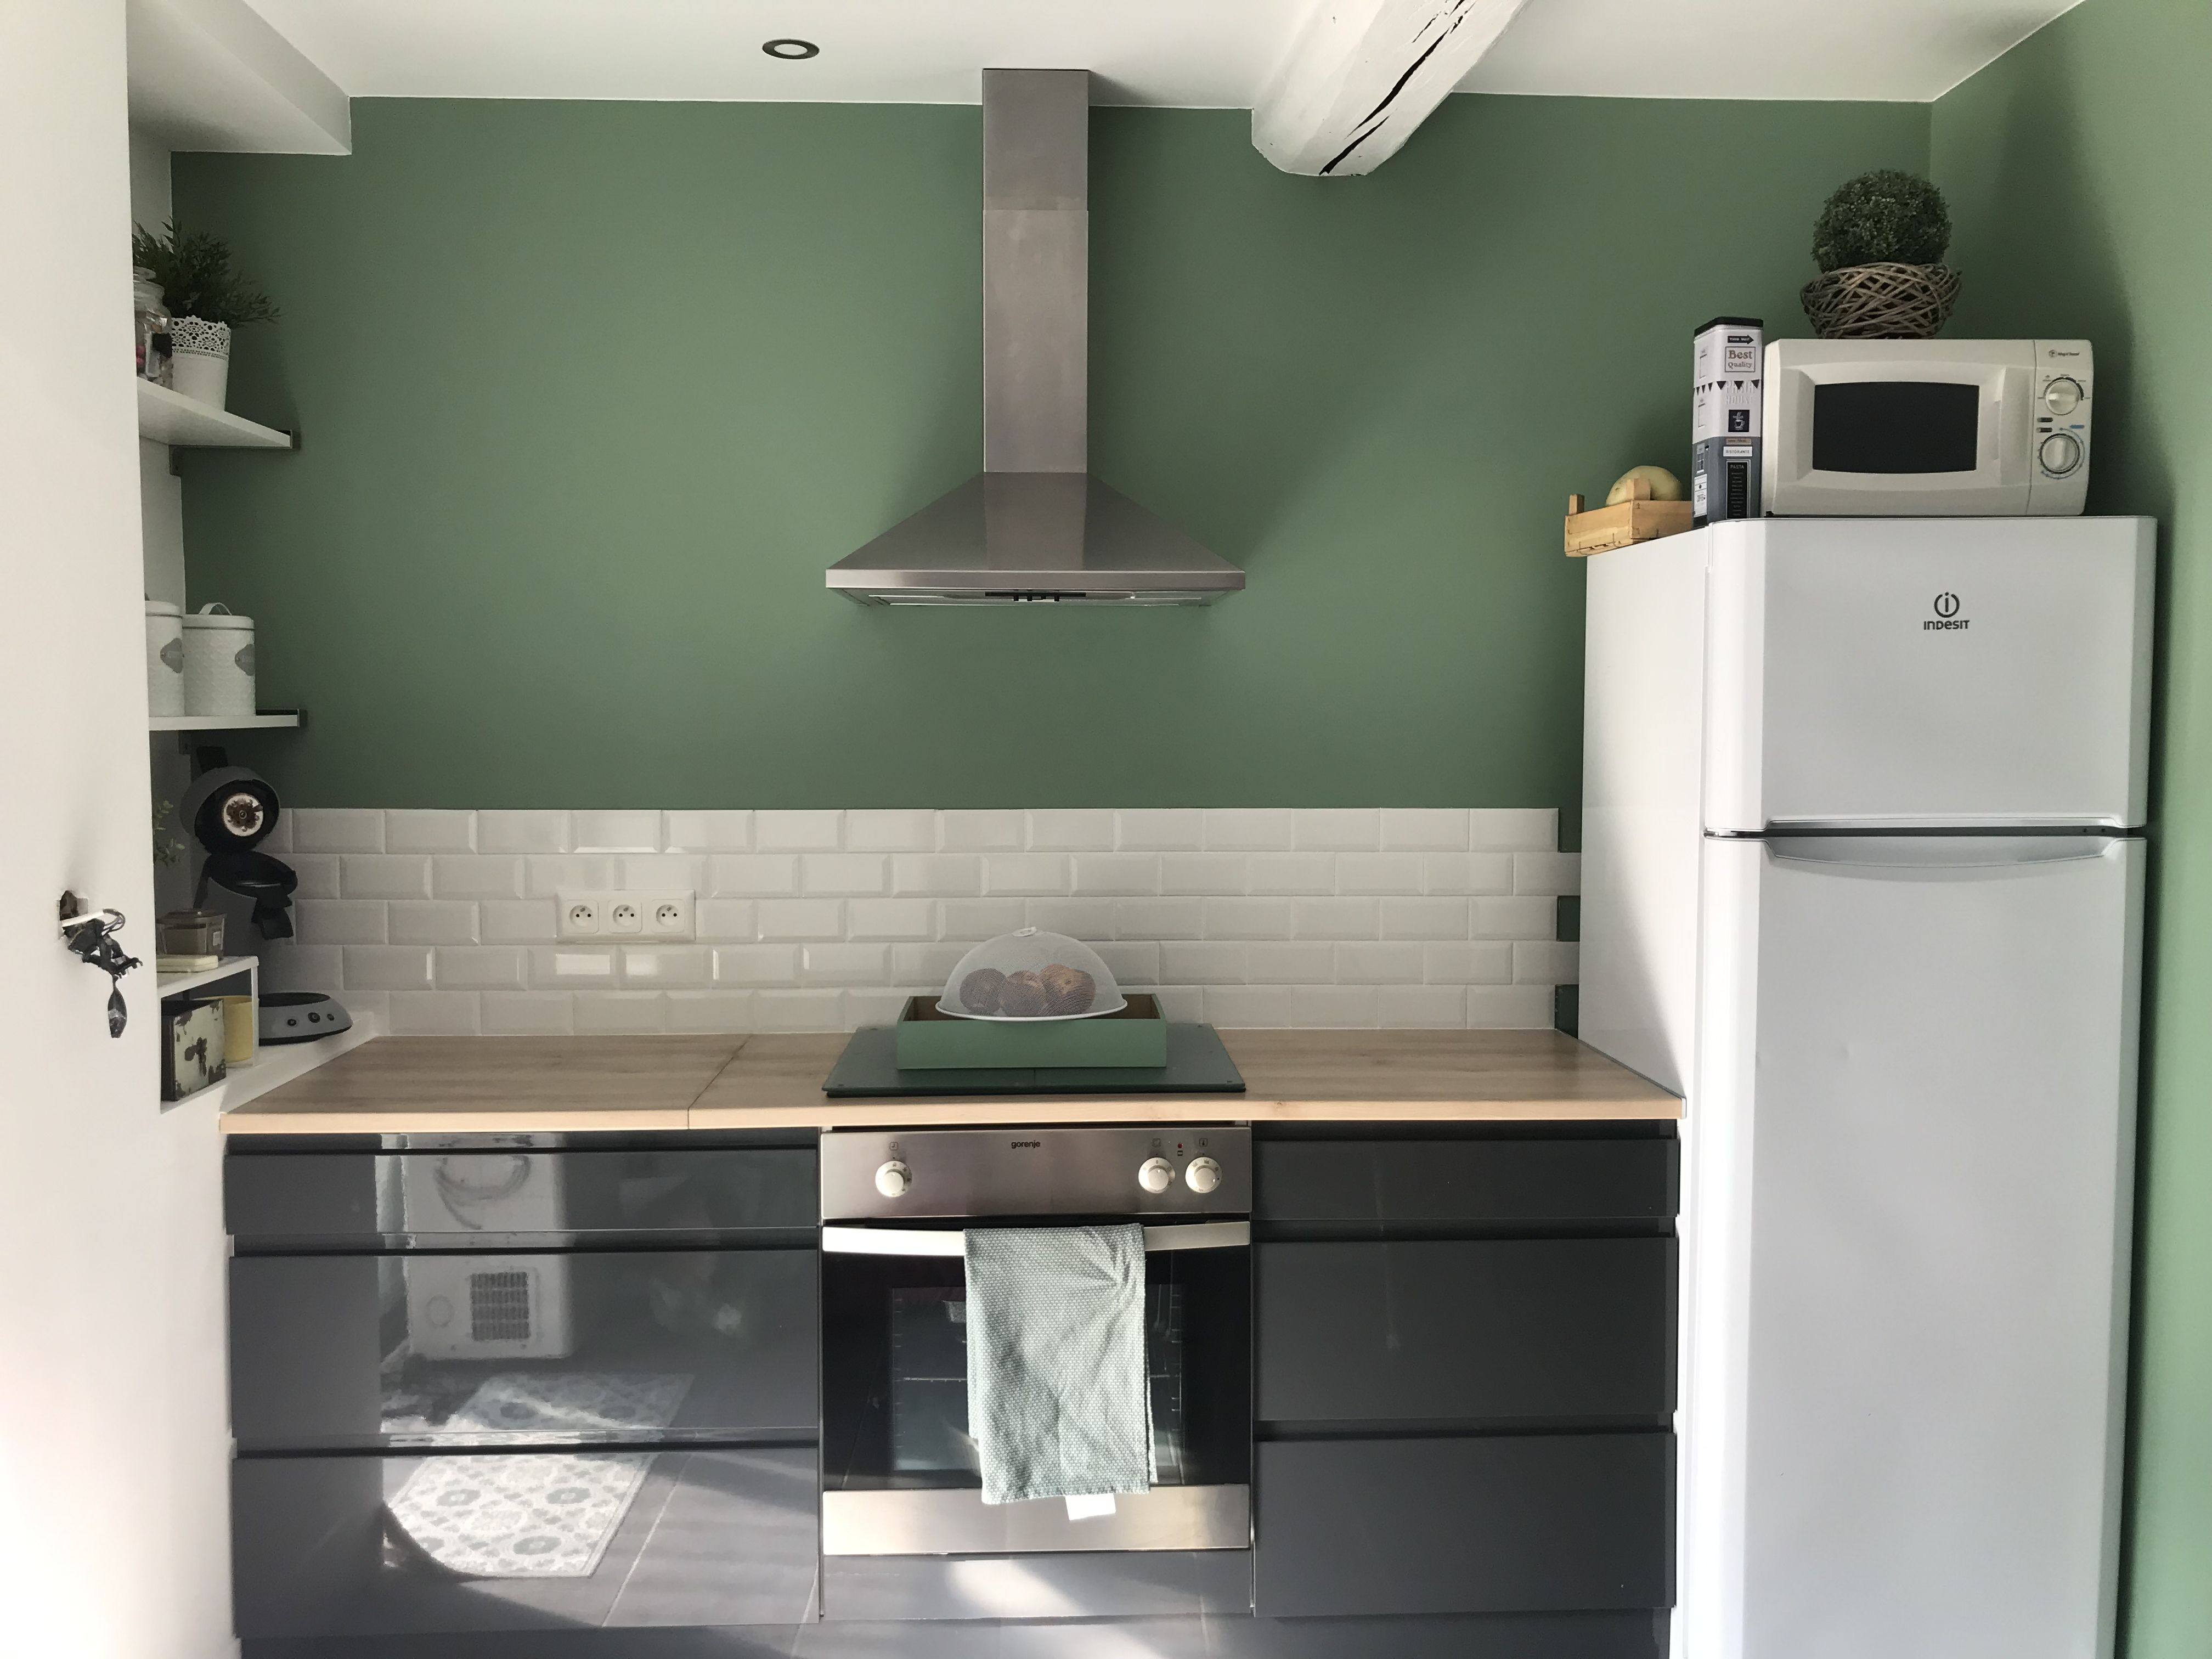 Cuisine grise vert carrelage métro | Cuisine gris, Cuisine gres, Carrelage métro cuisine